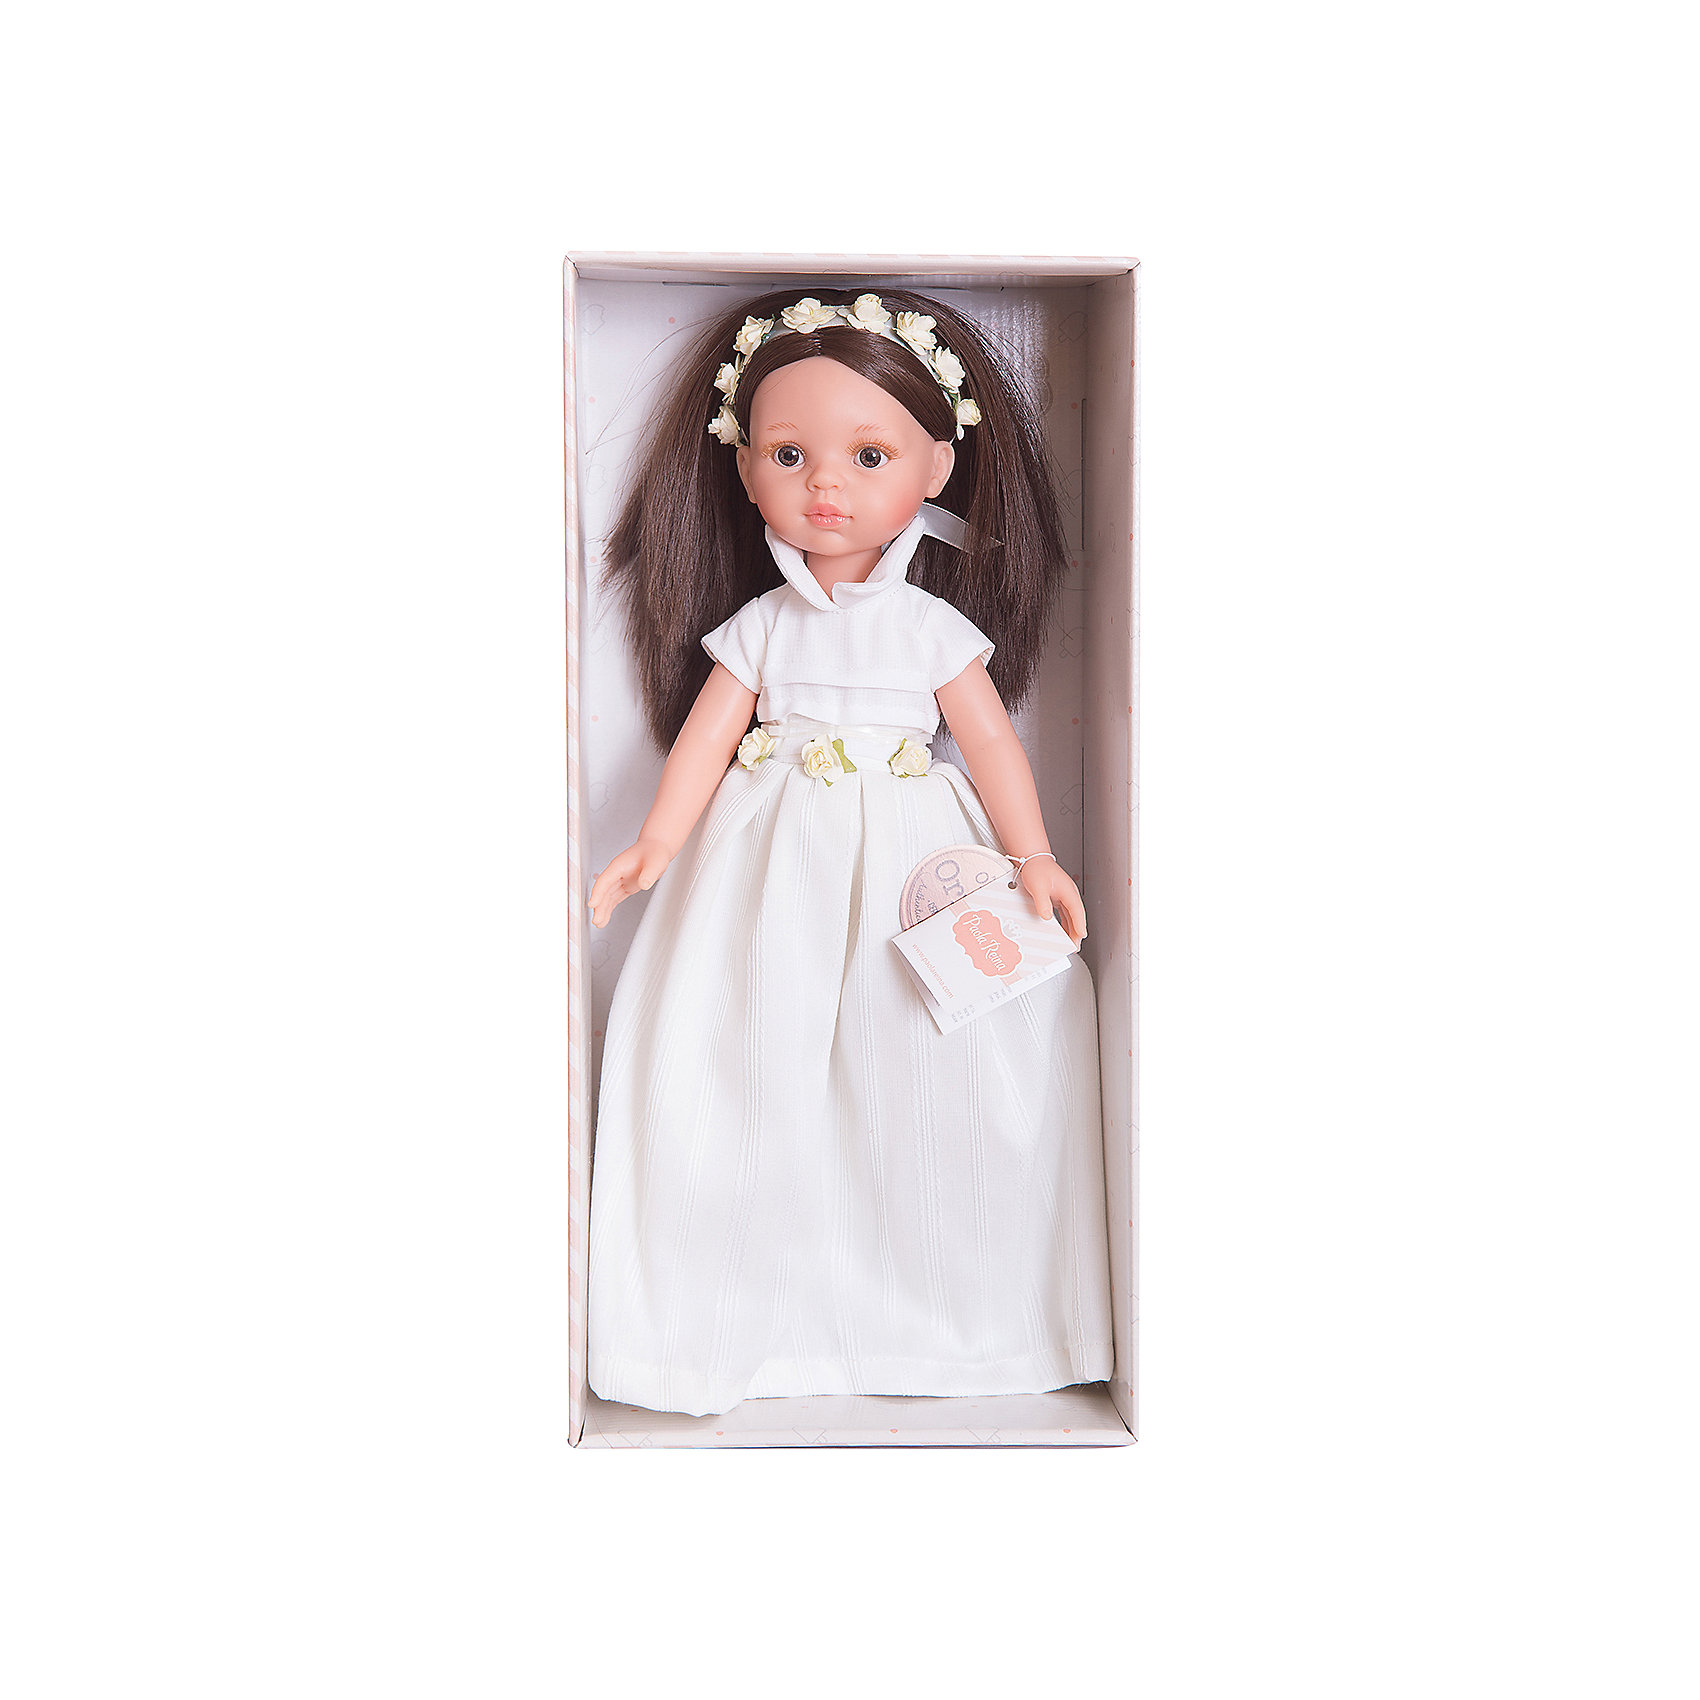 Paola Reina Кукла Кэрол, 32 см, Paola Reina кукла пупс без одежды 22см 31014 paola reina